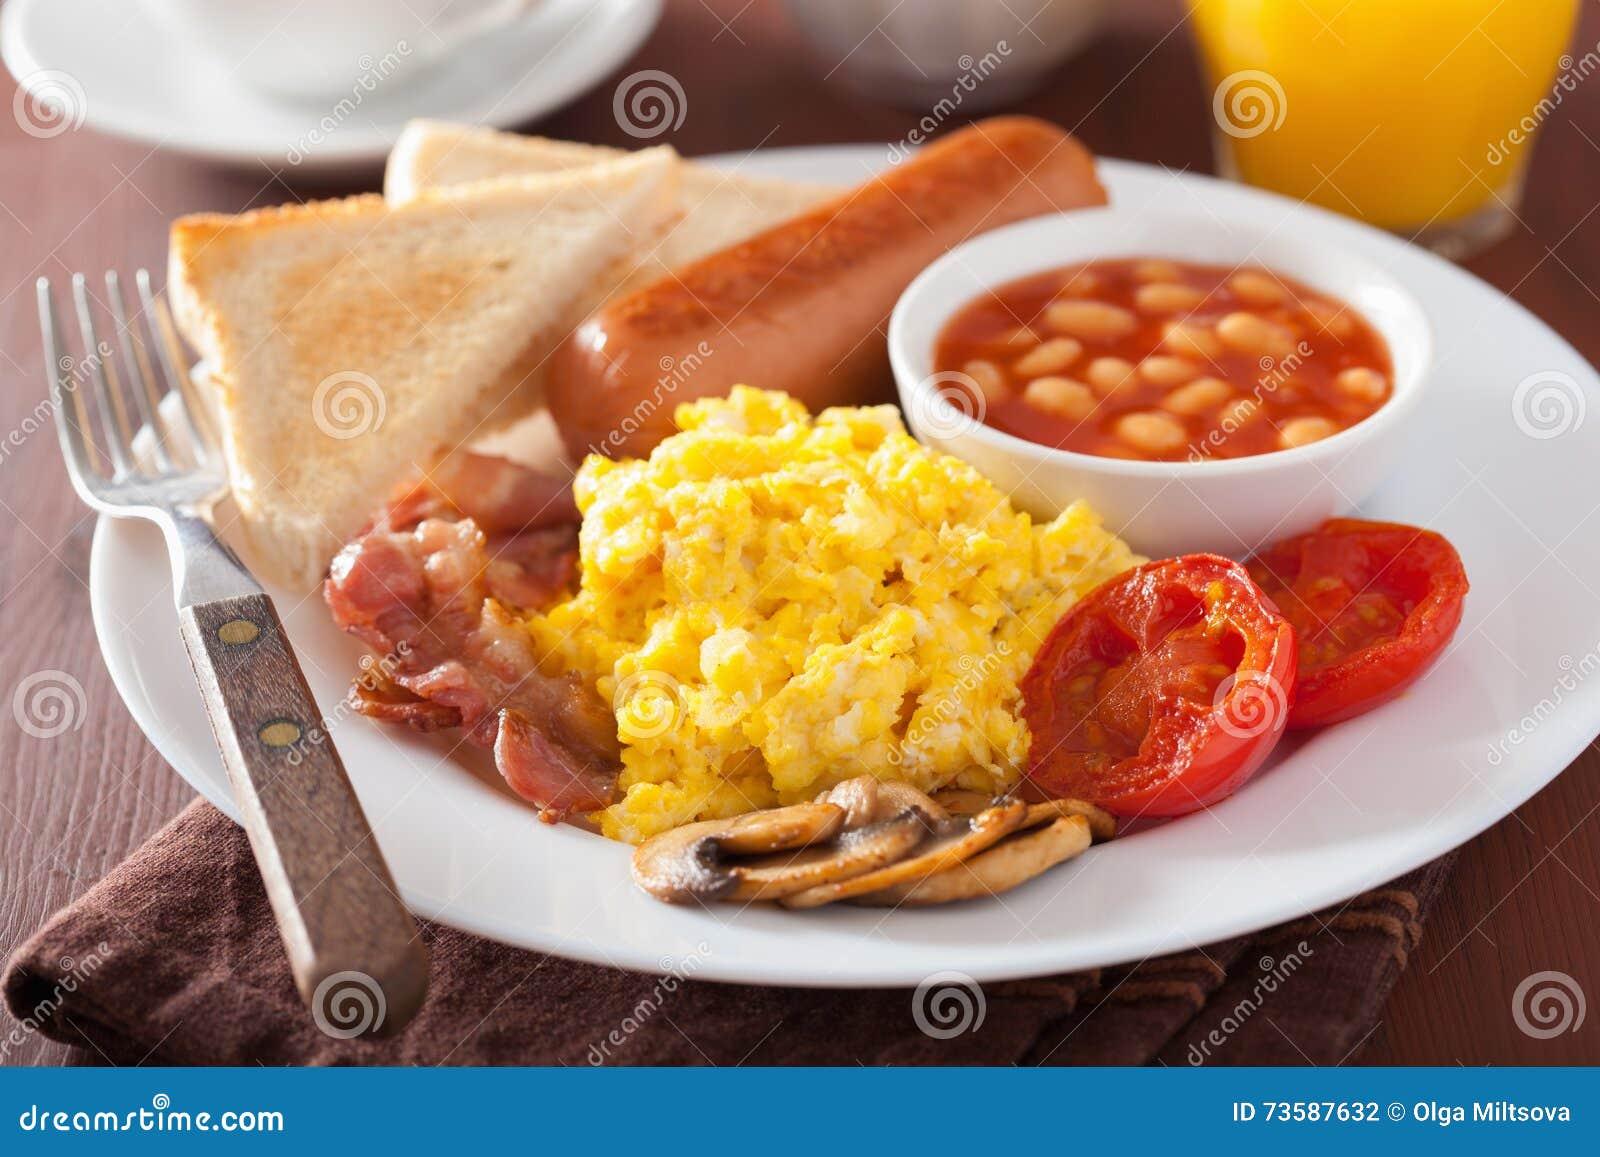 full english breakfast scrambled eggs bacon sausage bean beans tomato 73587632 Orange Coffee Table Heart Shaped Fried Eggs Bread And Orange Juice Stock Photo Image